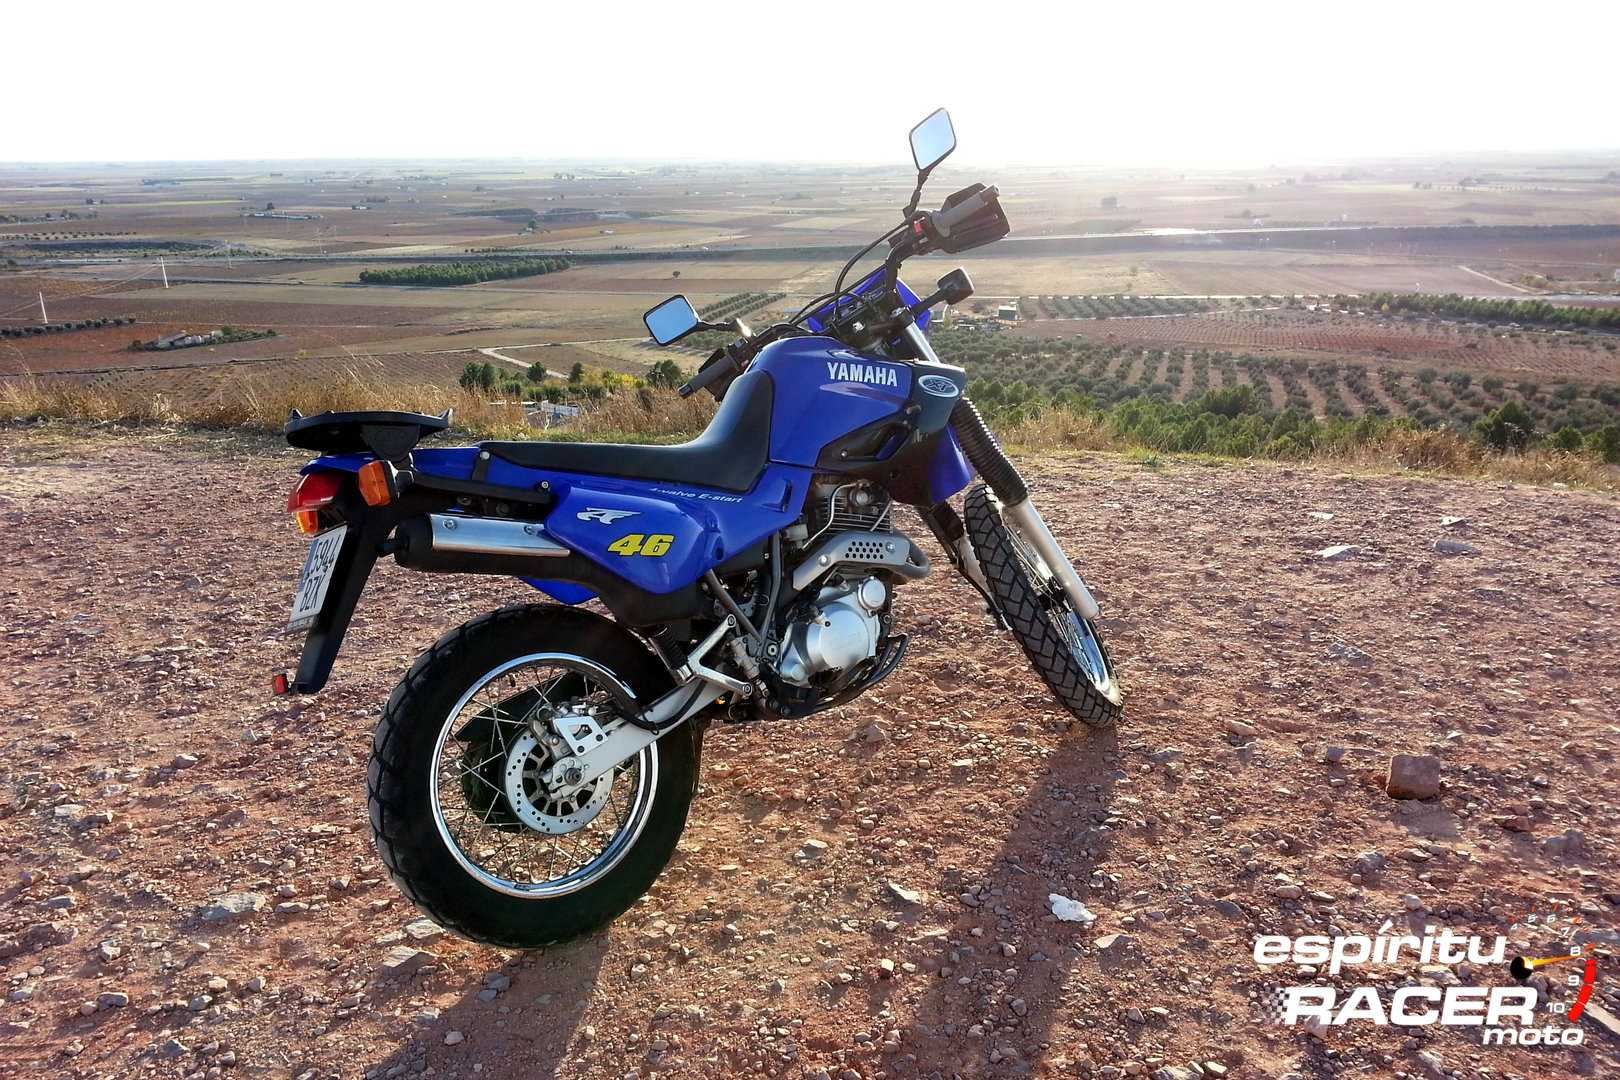 Moto del día: Yamaha XT 600 E